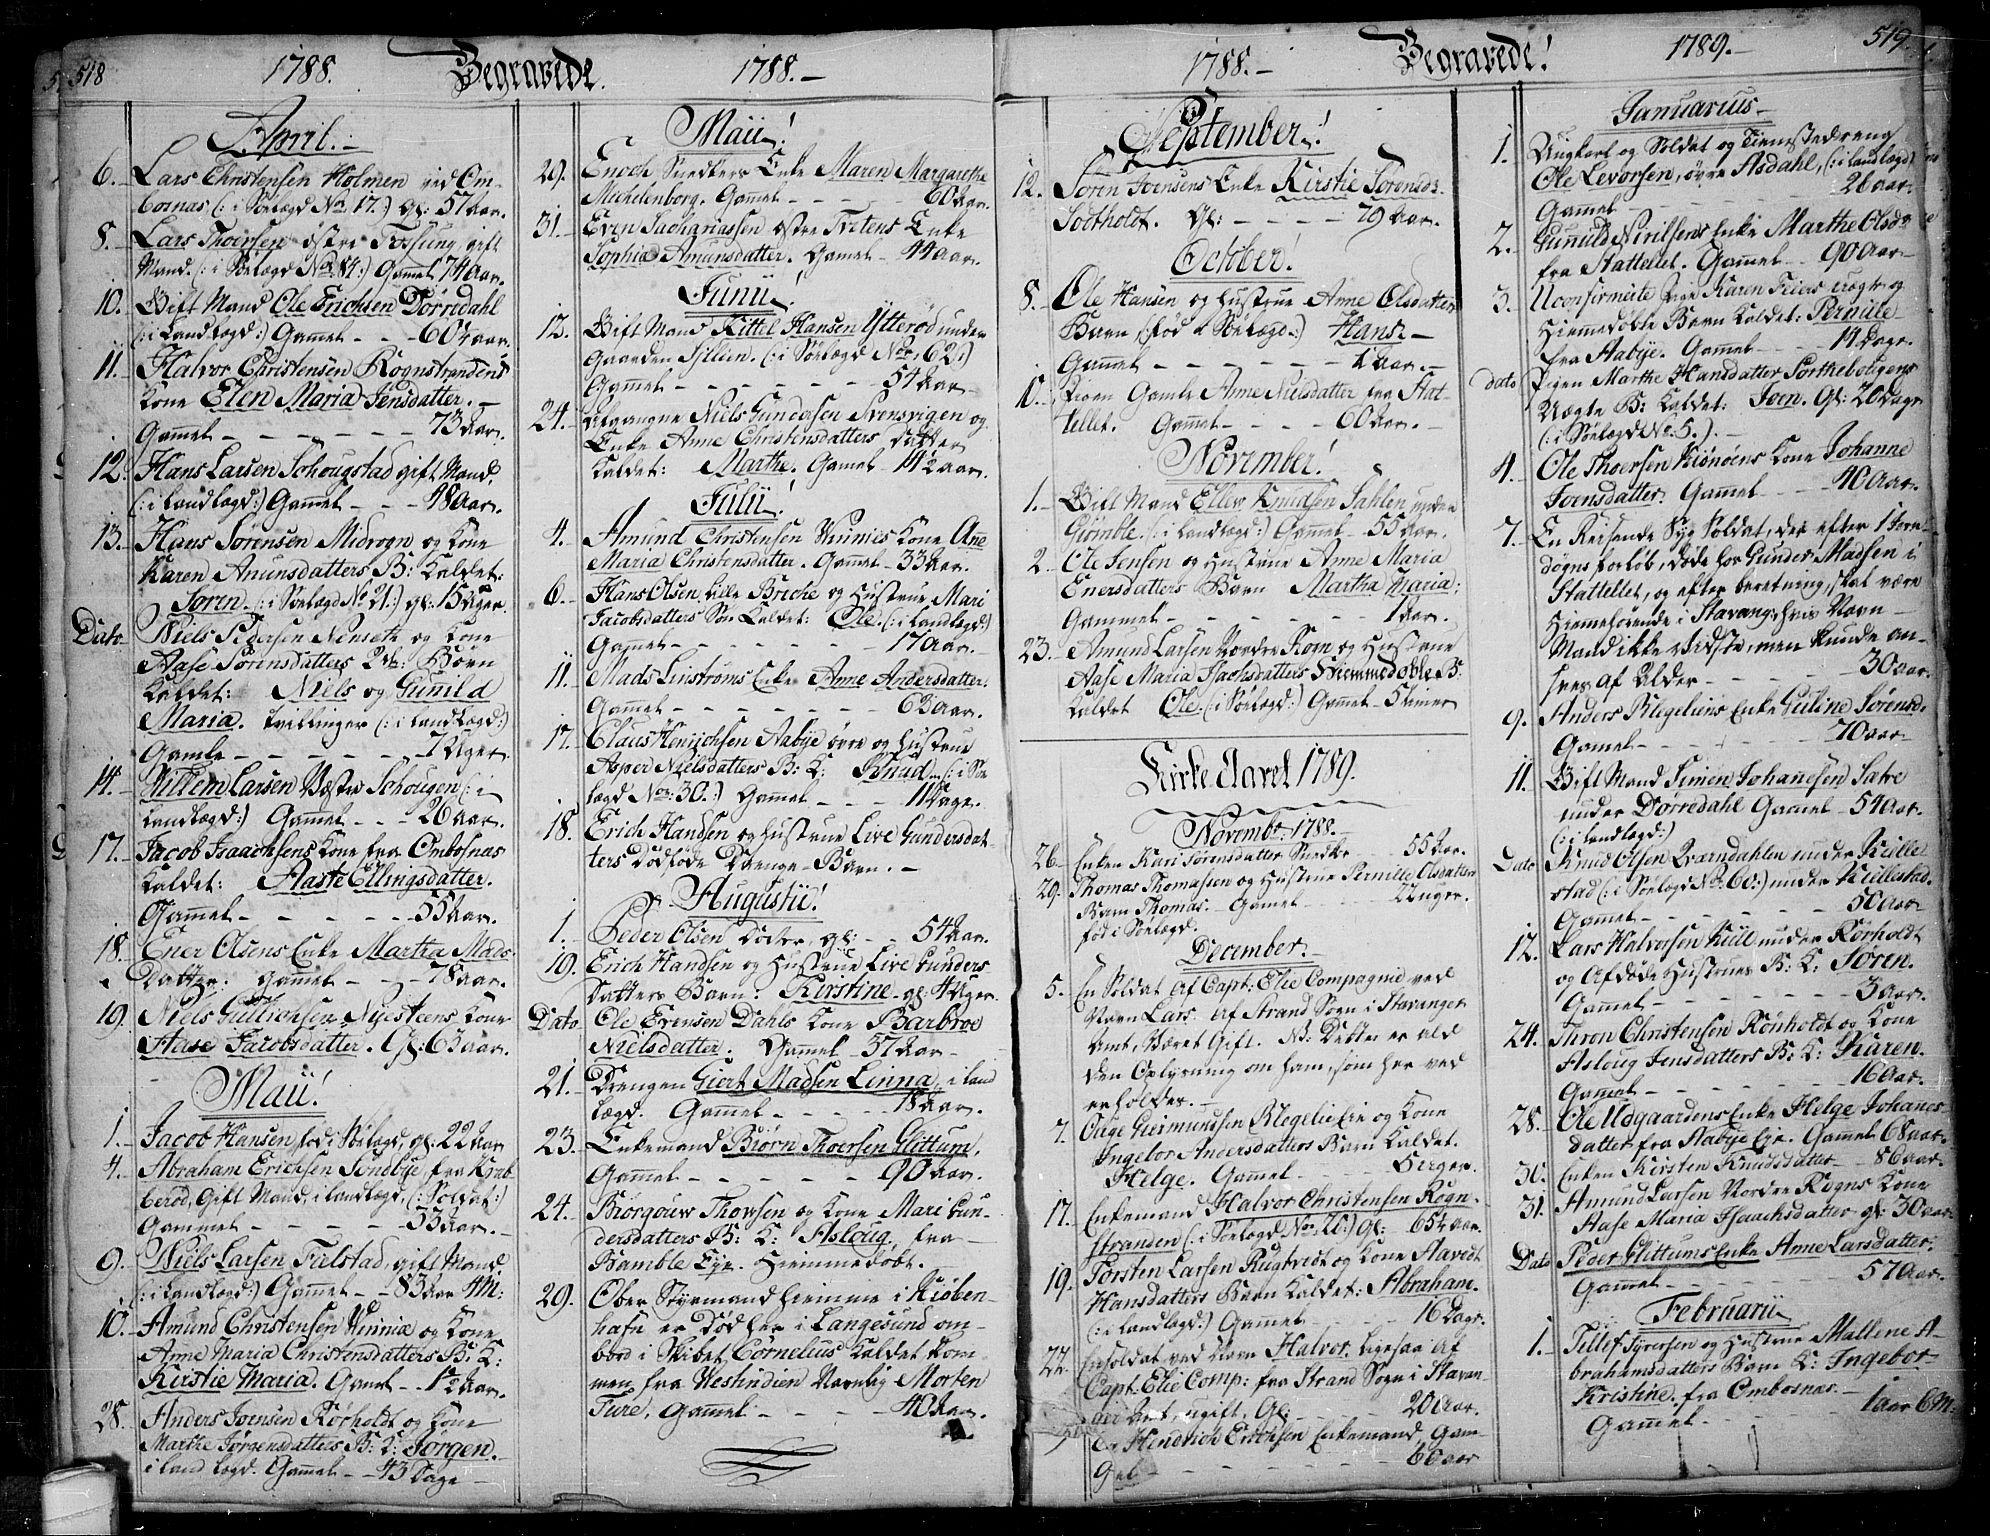 SAKO, Bamble kirkebøker, F/Fa/L0002: Ministerialbok nr. I 2, 1775-1814, s. 518-519